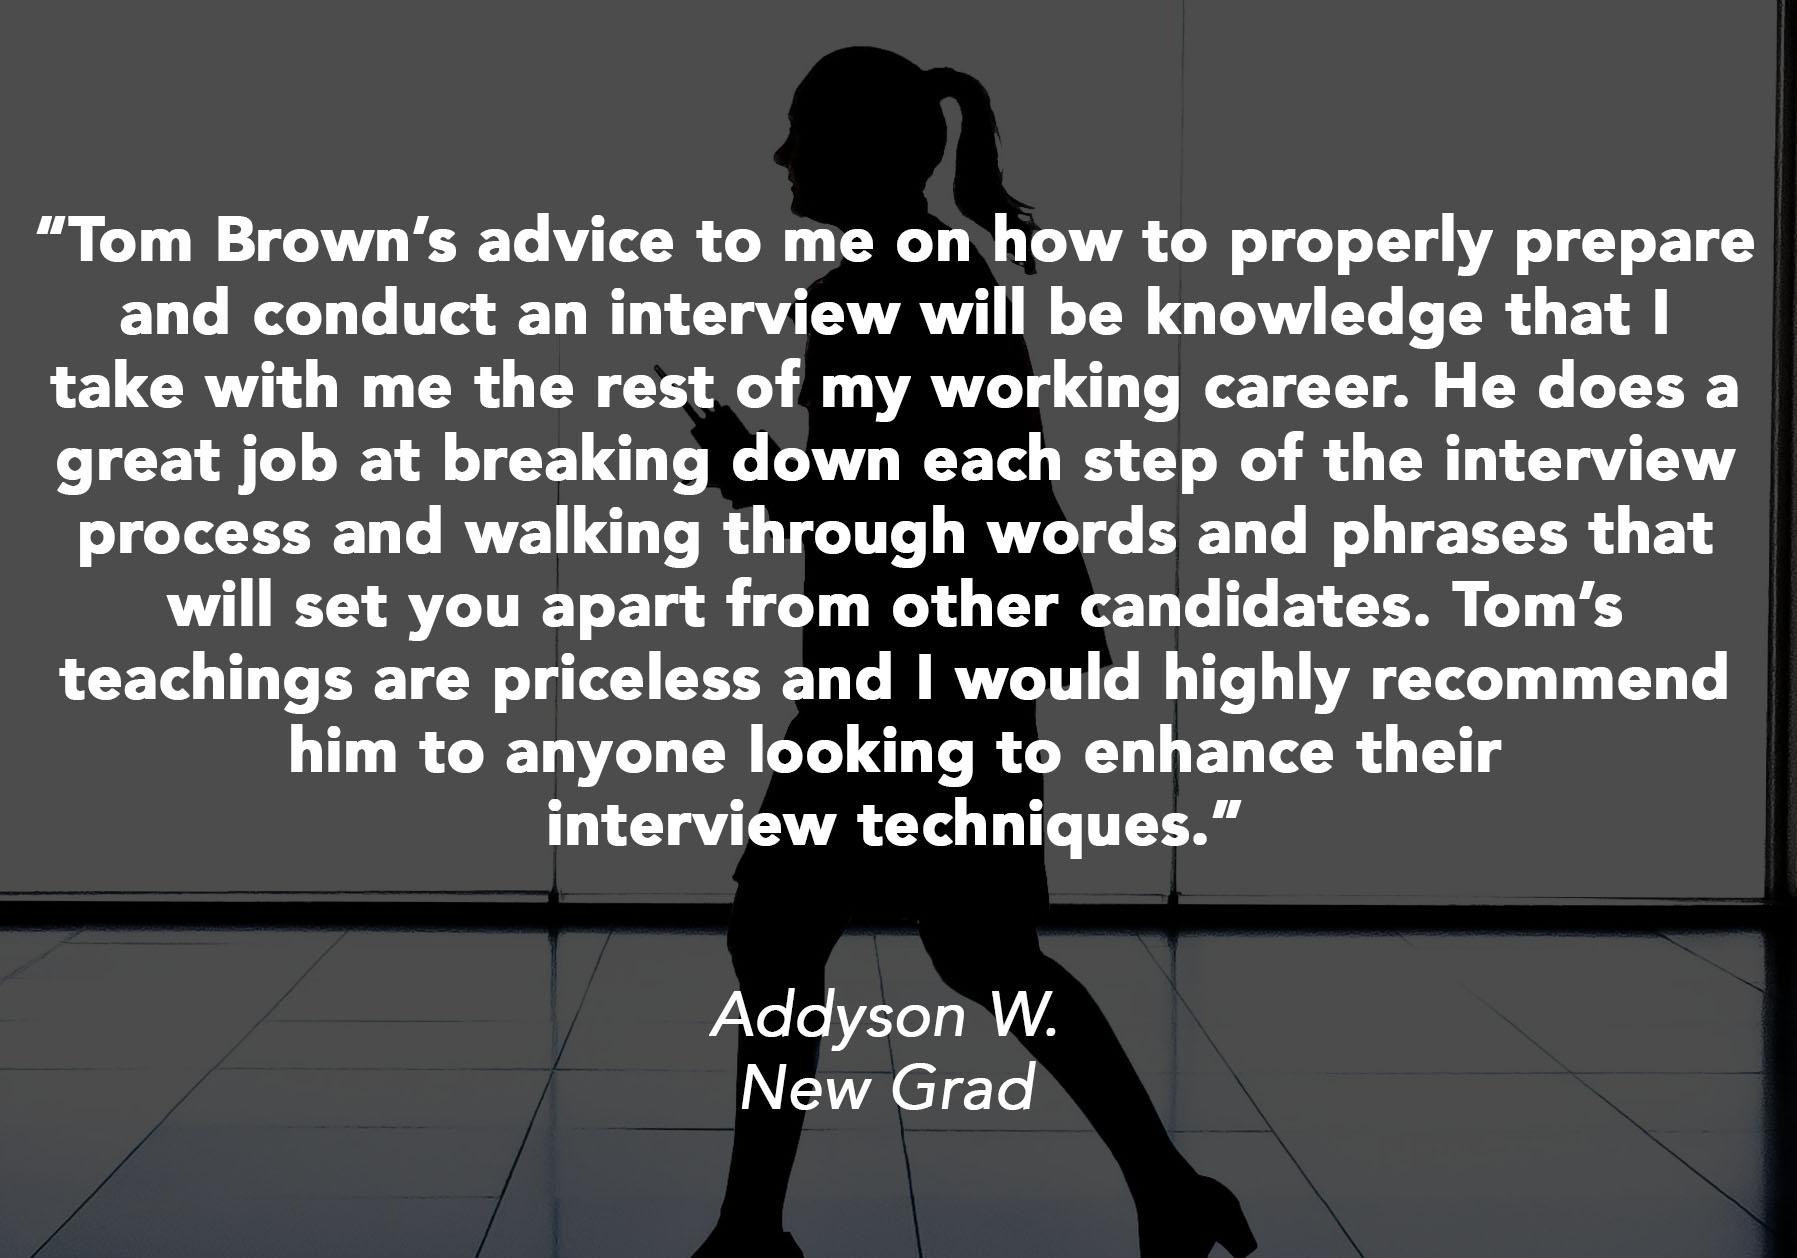 interview coaching solutions job career coach AddysonW.jpg